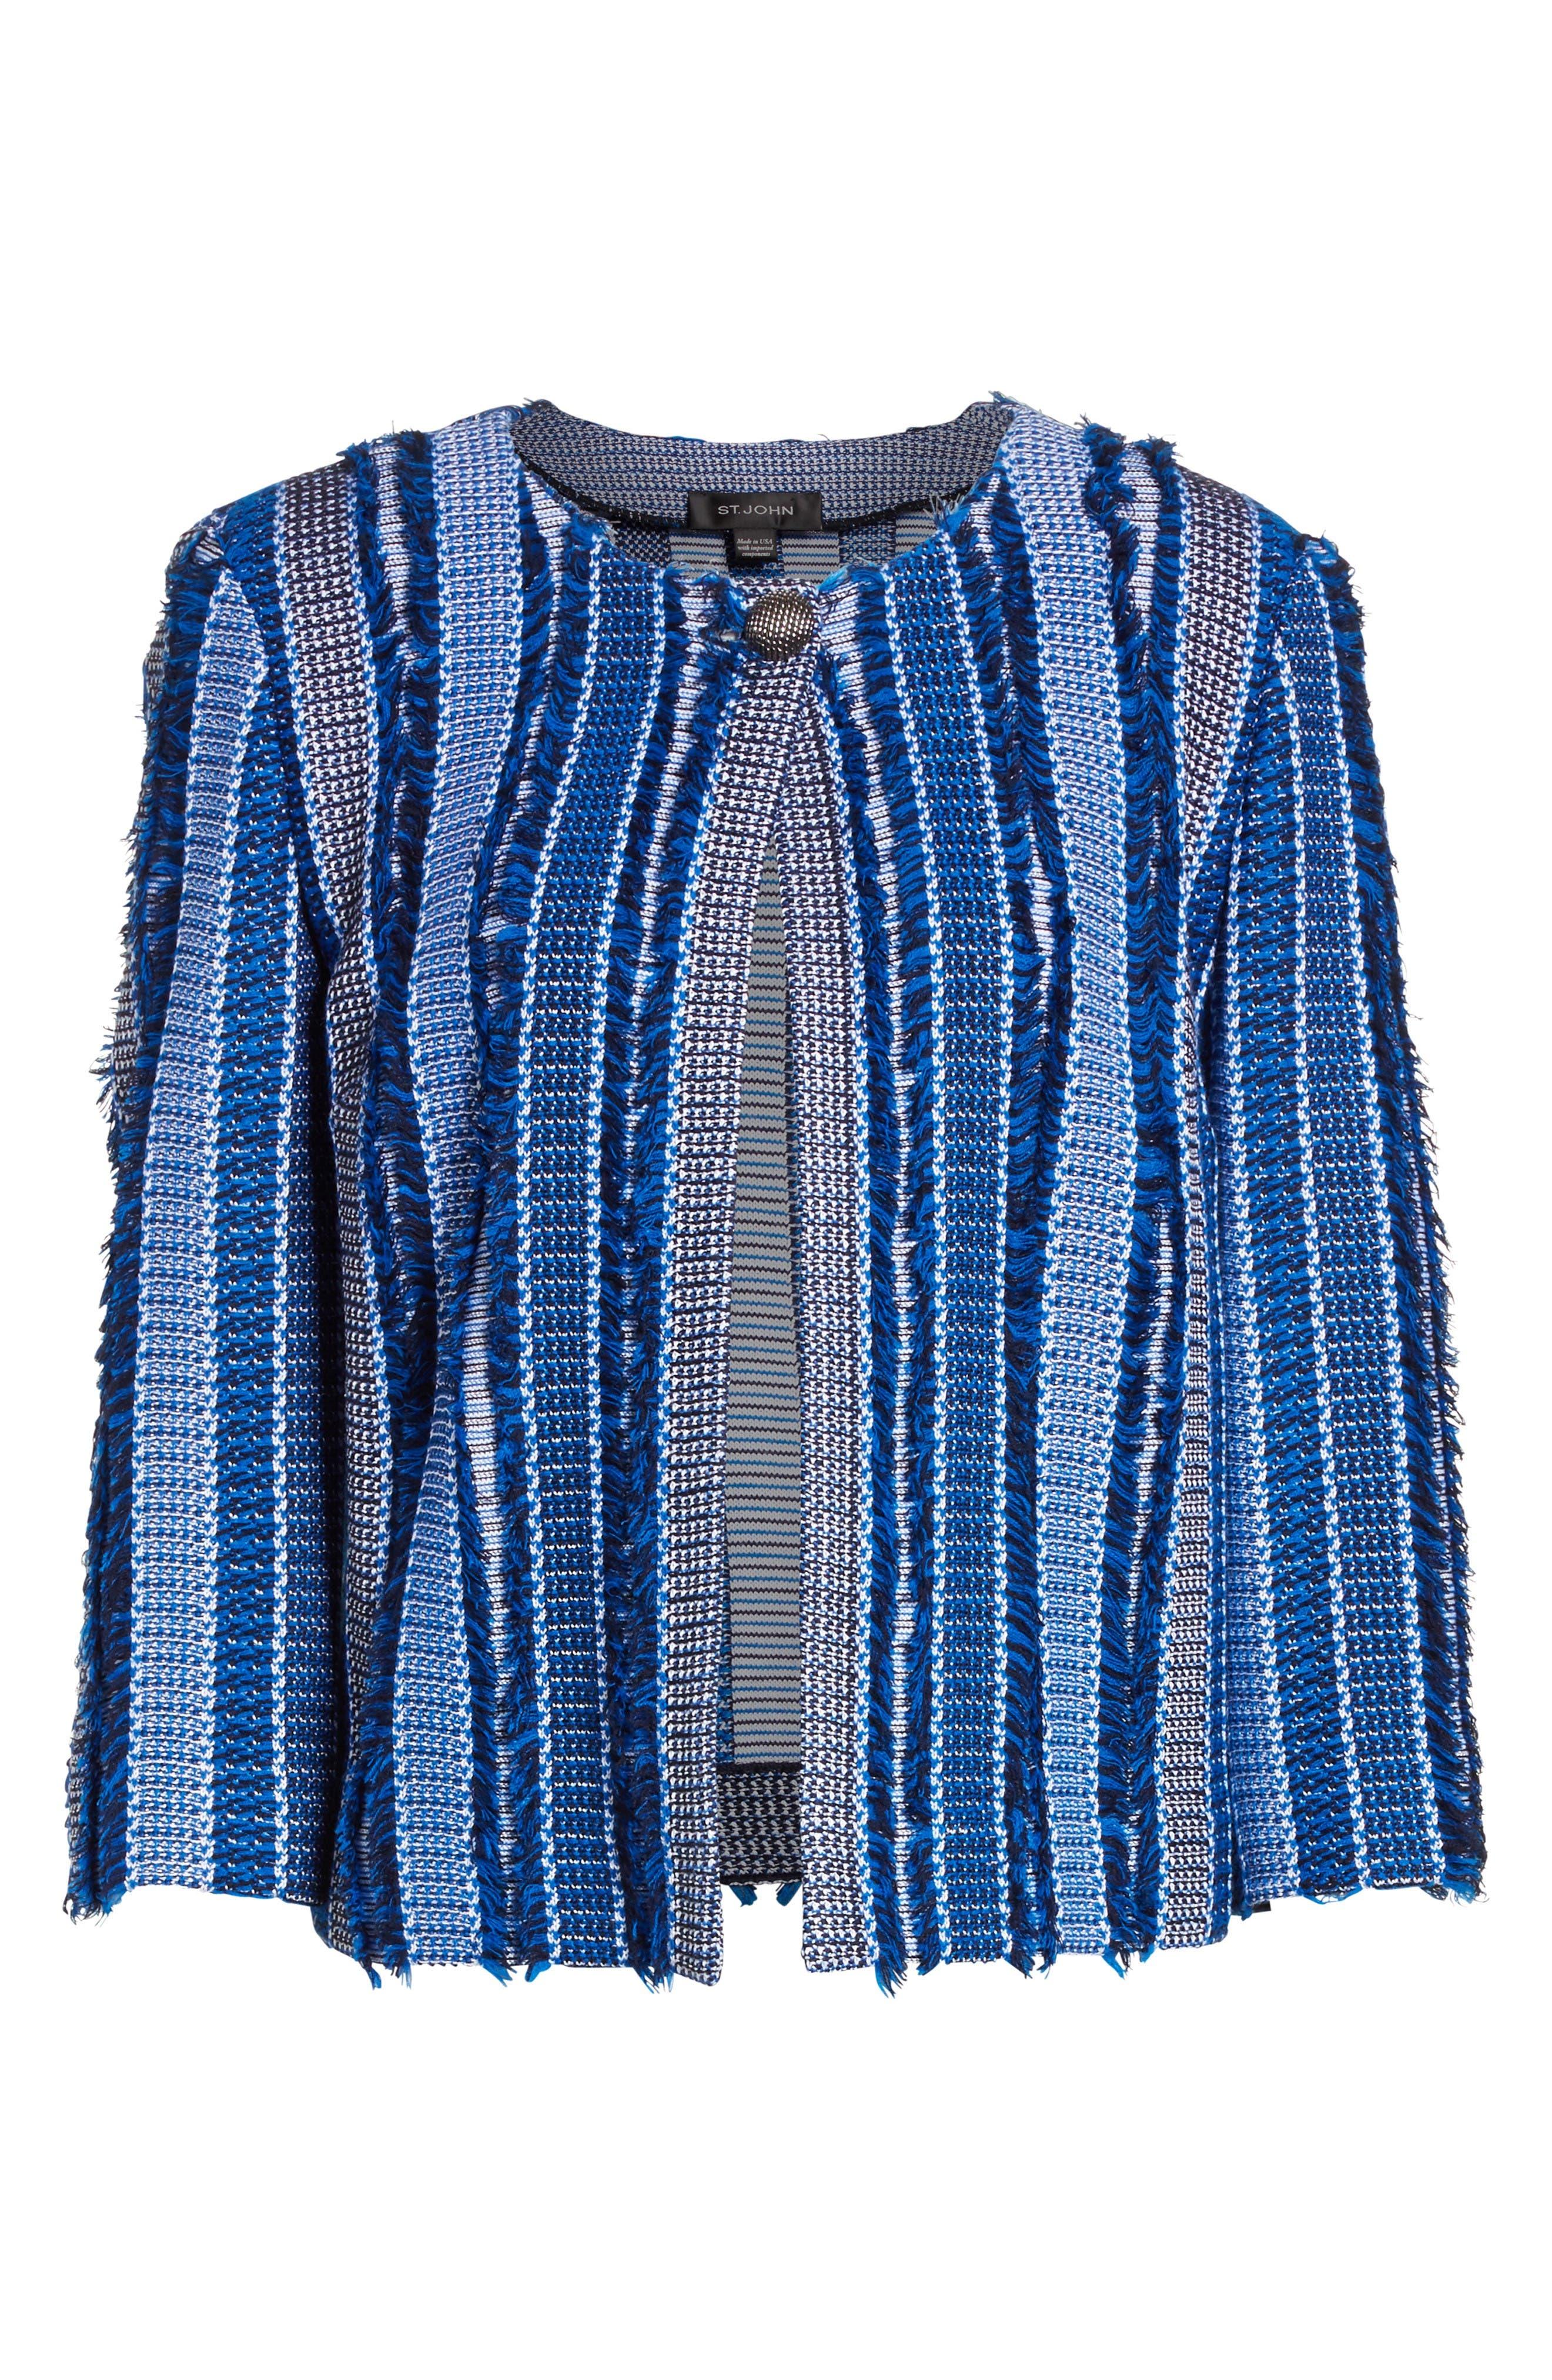 Damik Fil Coupé Knit Jacket,                             Alternate thumbnail 6, color,                             Jaya Blue Multi